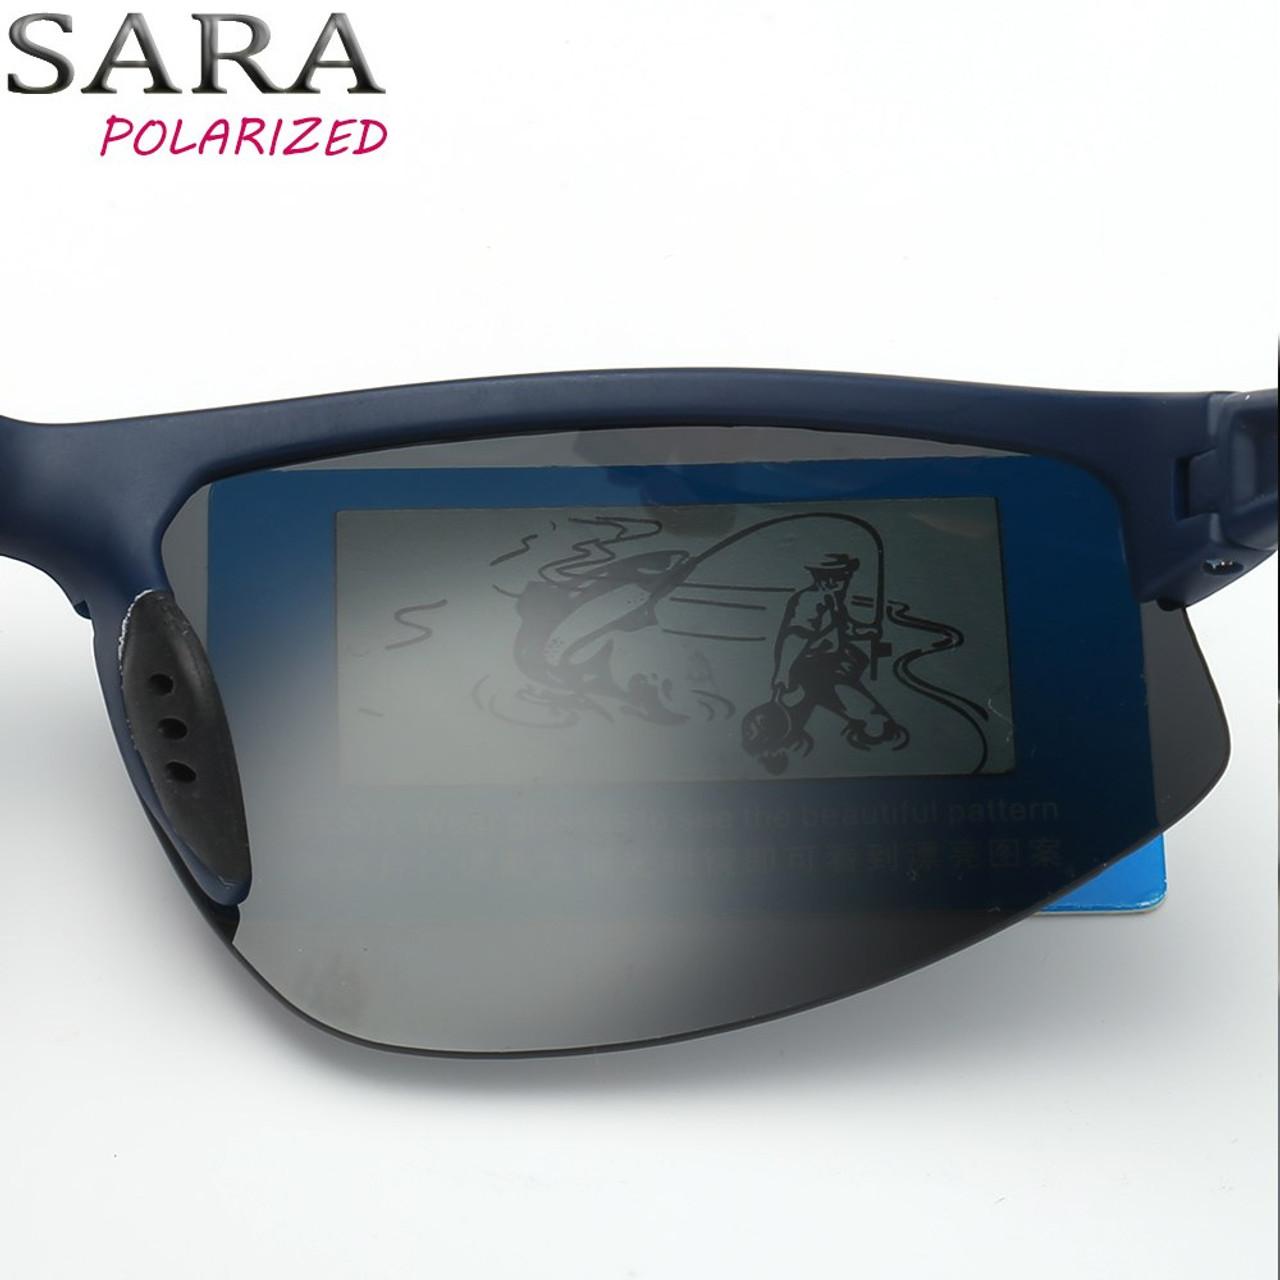 0044993af3321 ... SARA Male Sun Glasses Fashion Sports Polarized Sunglasses For Men Women  UV400 Driving Fishing Shades Lenses ...